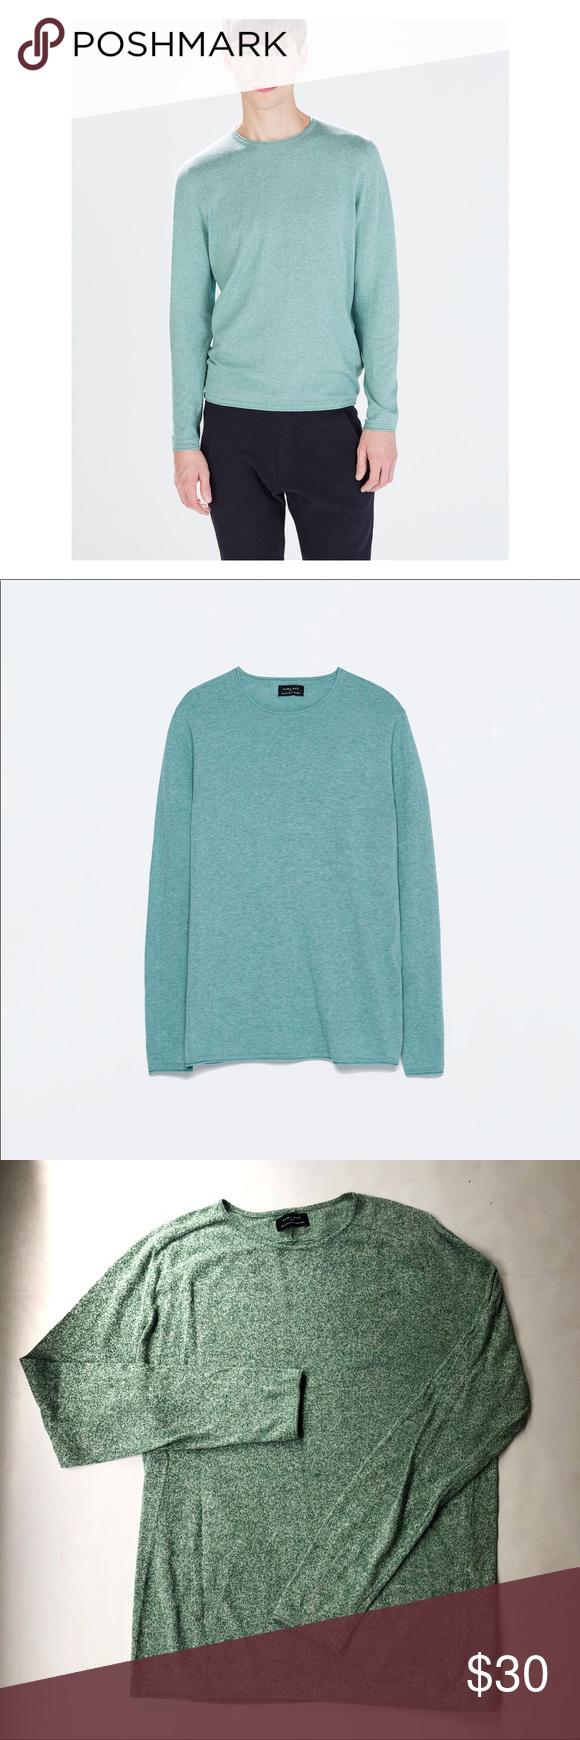 eb4b89fca Zara  HOST PICK Basic Mens Knit Sweater Size XL in 2018